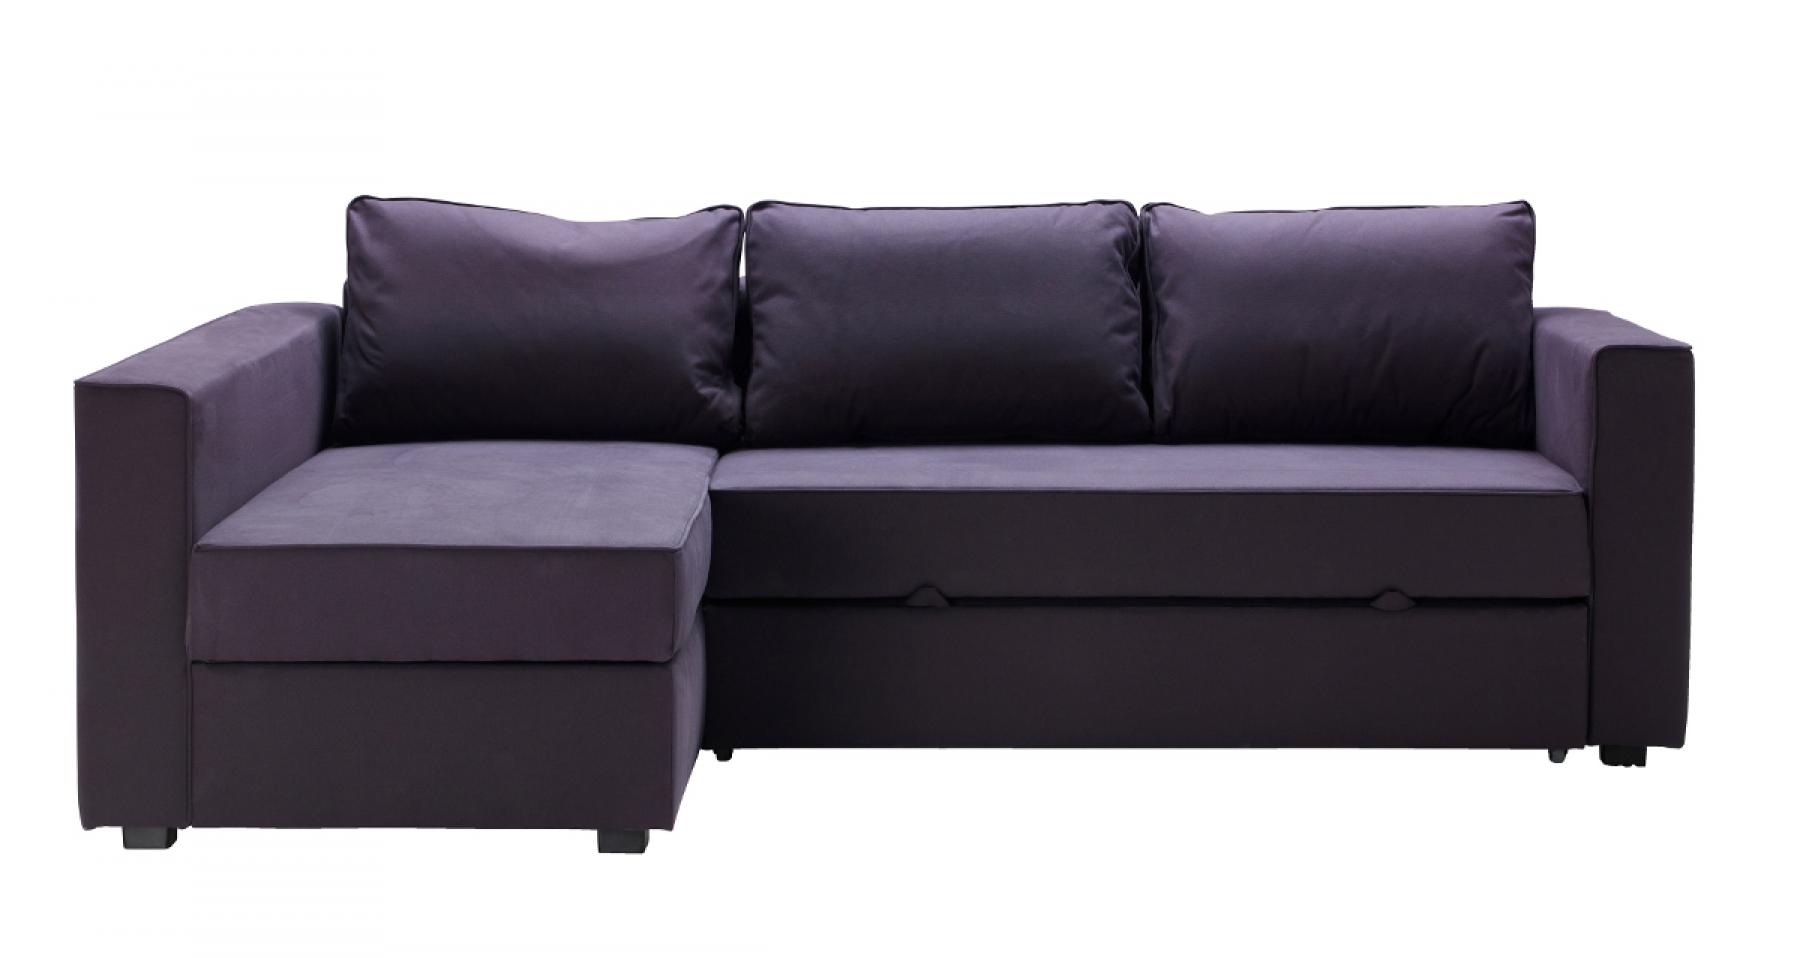 Canap Friheten Friheten Convertible Duangle Ikea Meubles With